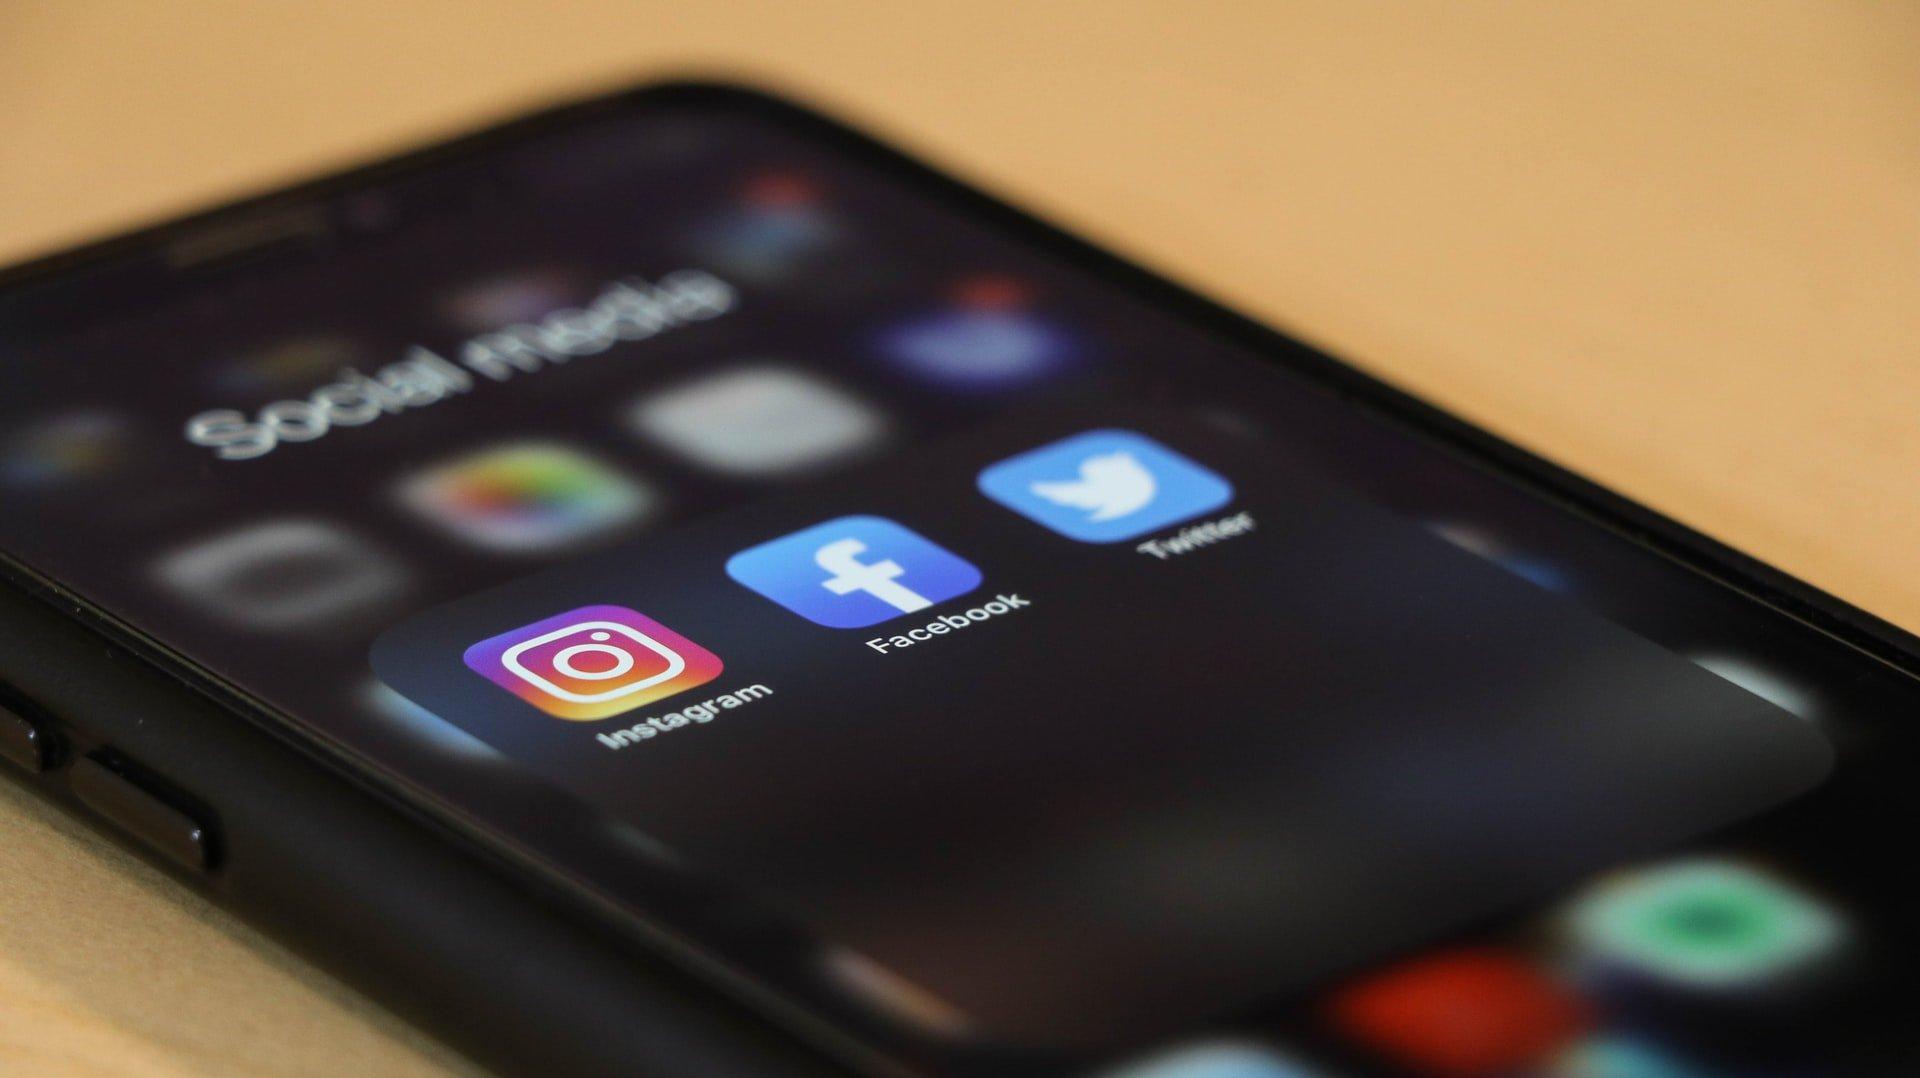 Social media apps on a smartphone.